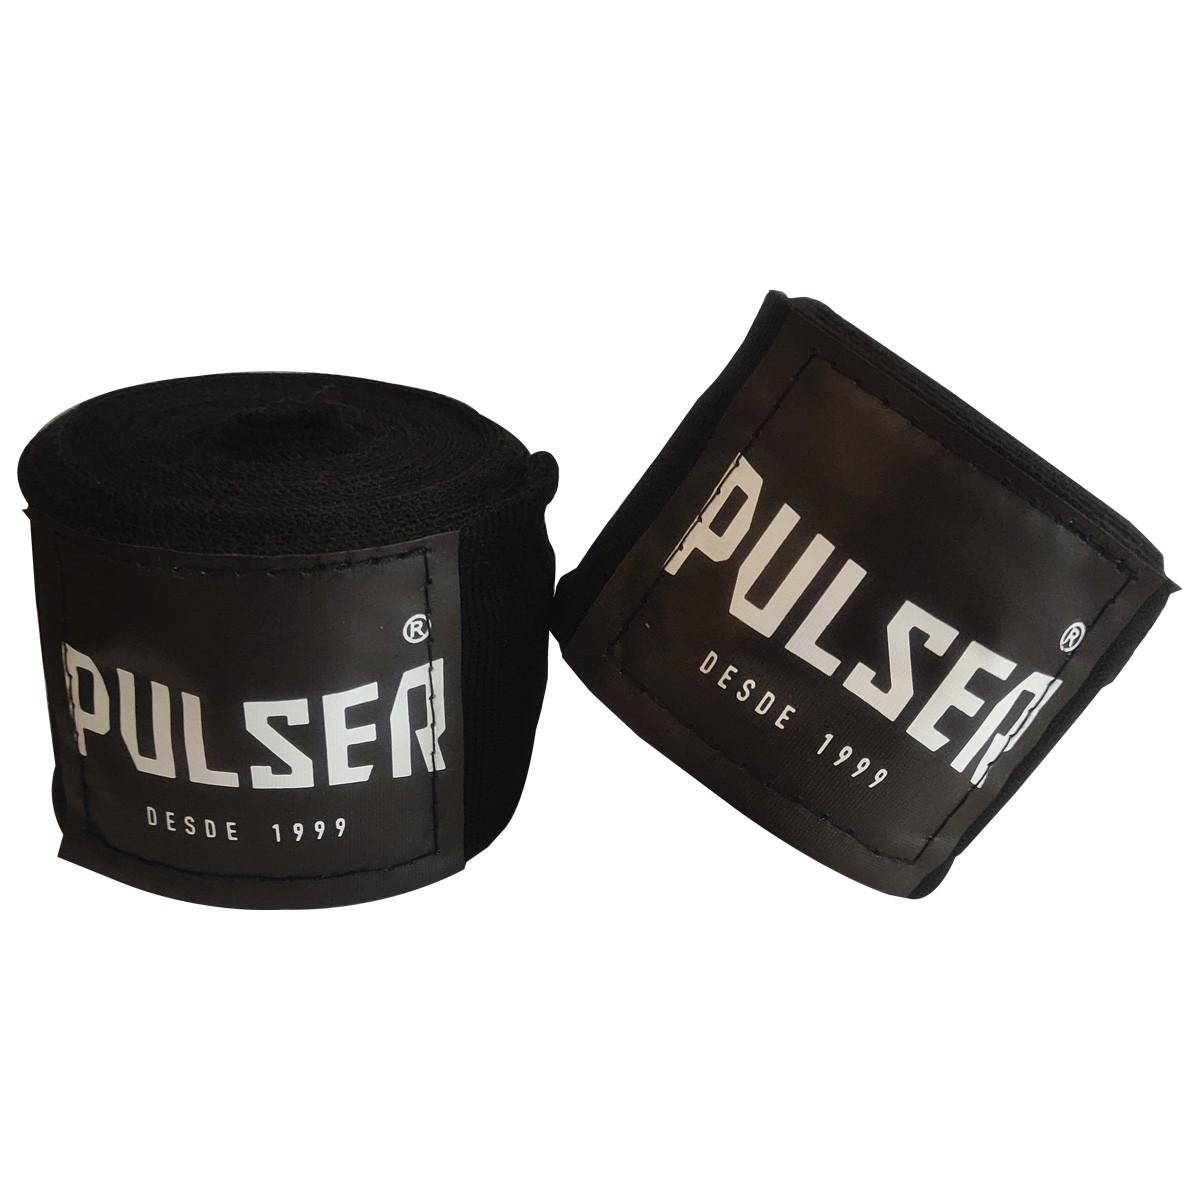 Par De Bandagem Atadura Elástica 3 Metros Muay Thai Boxe - Pulser  - PRALUTA SHOP